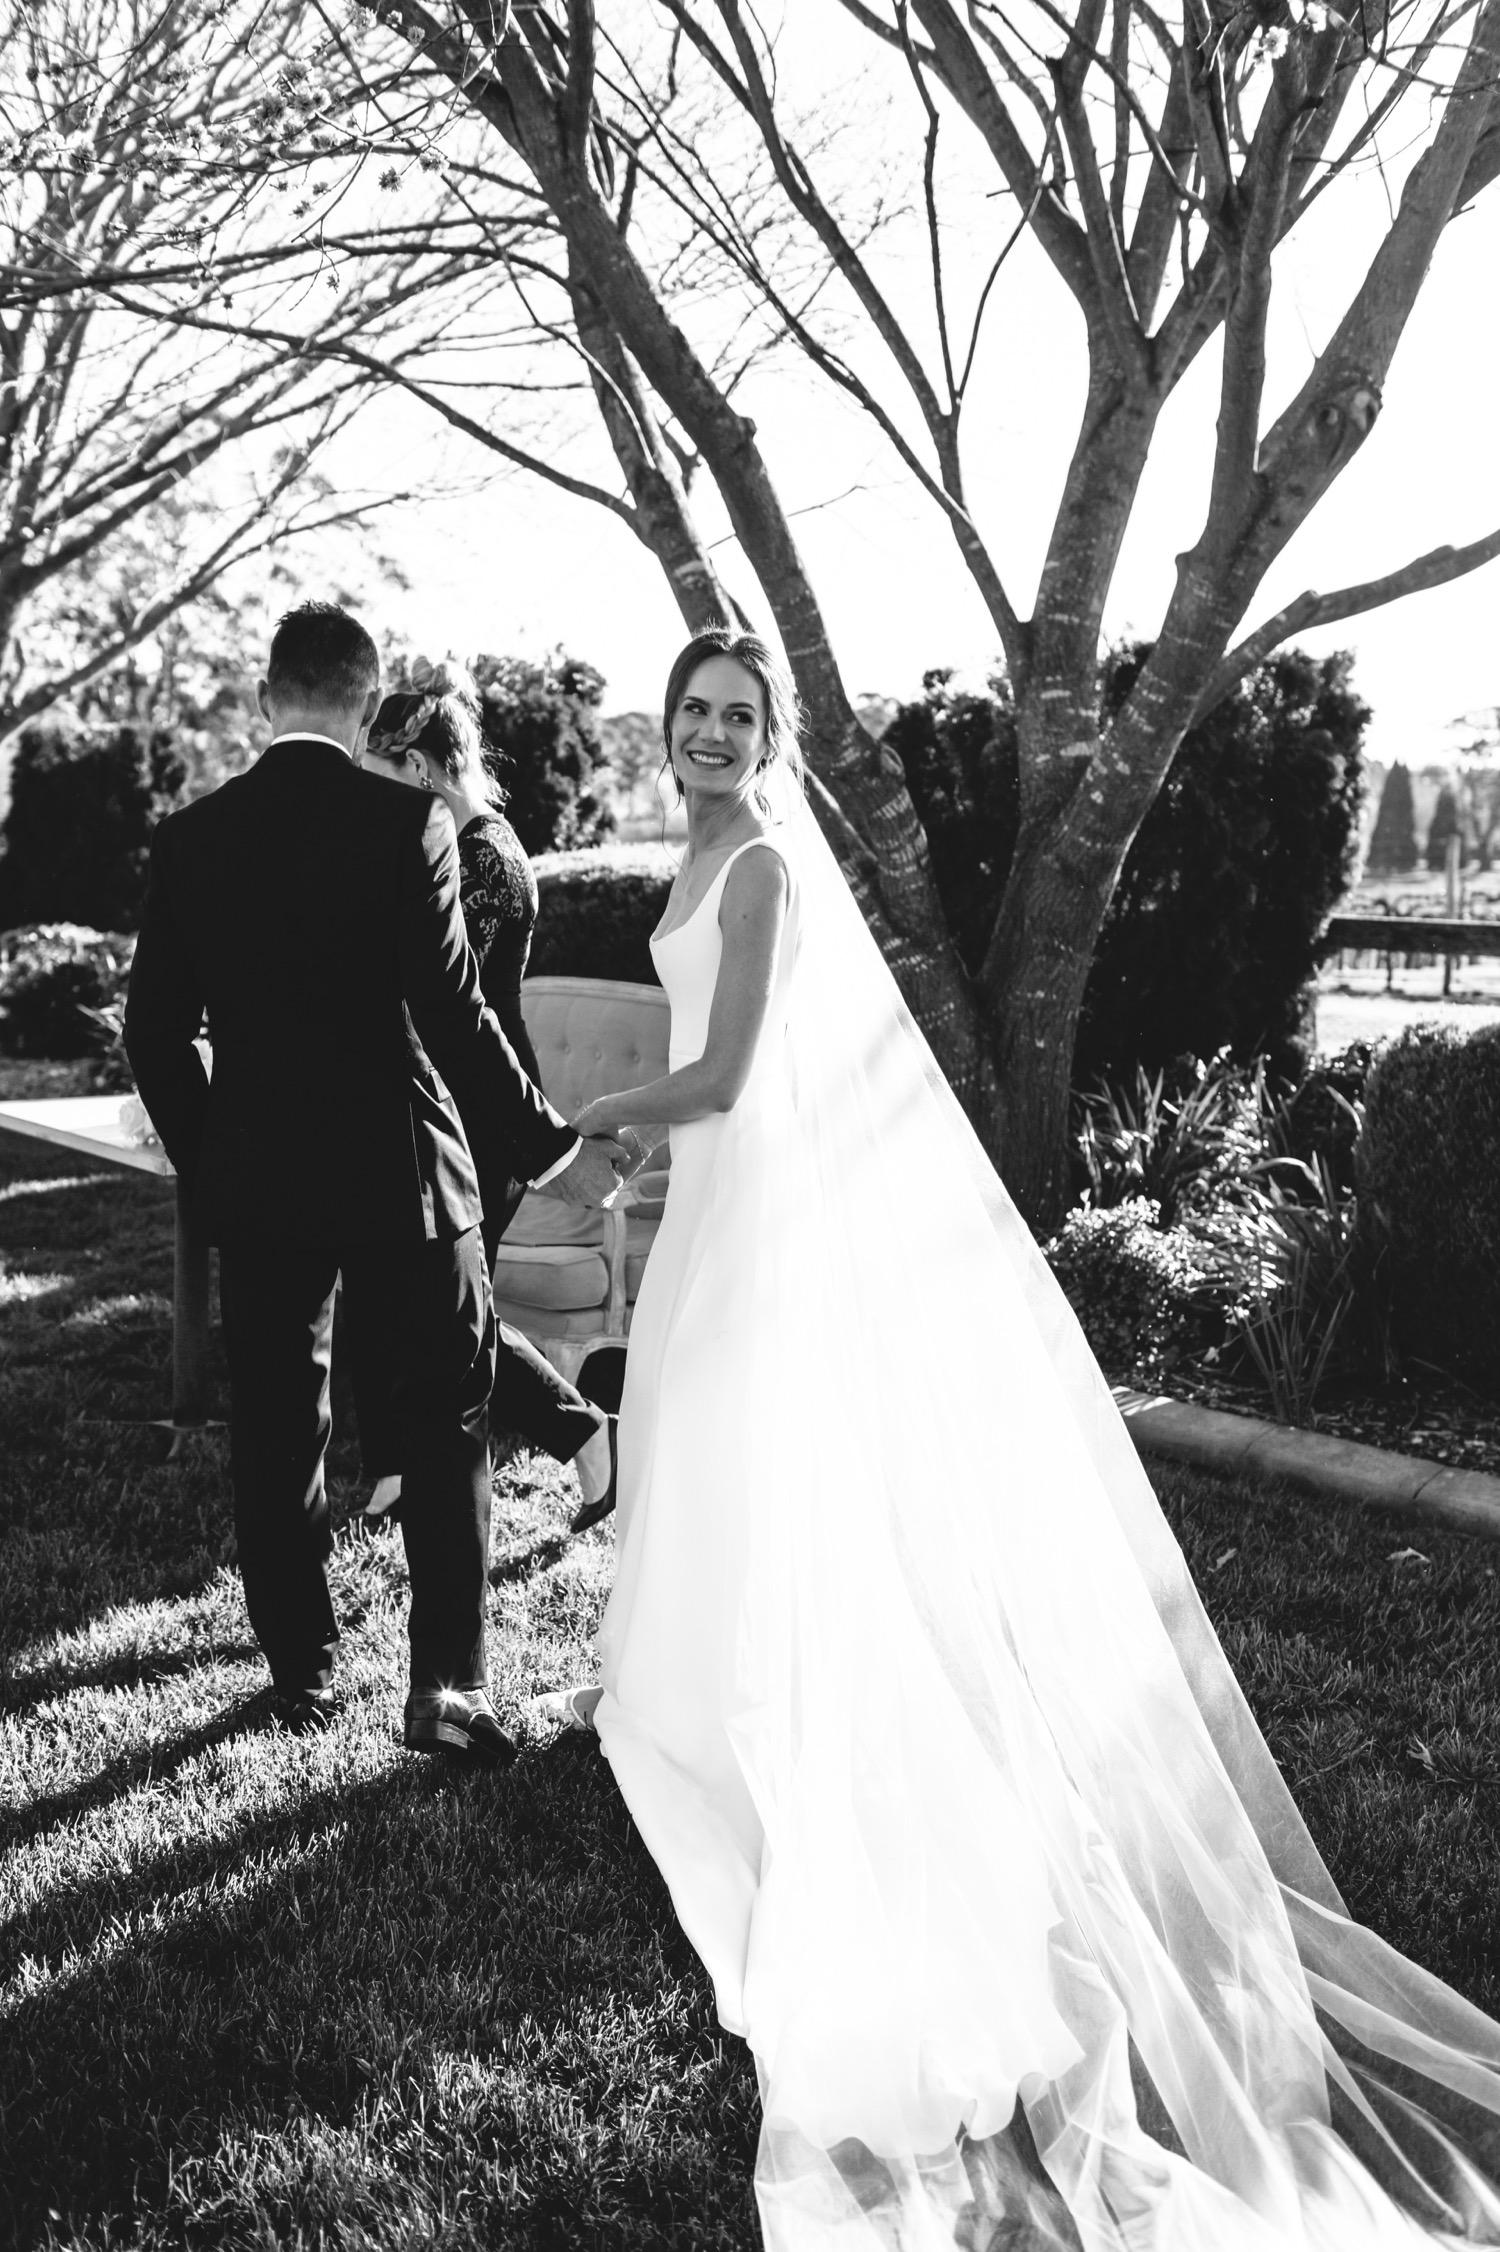 Centennial vineyards wedding ceremony